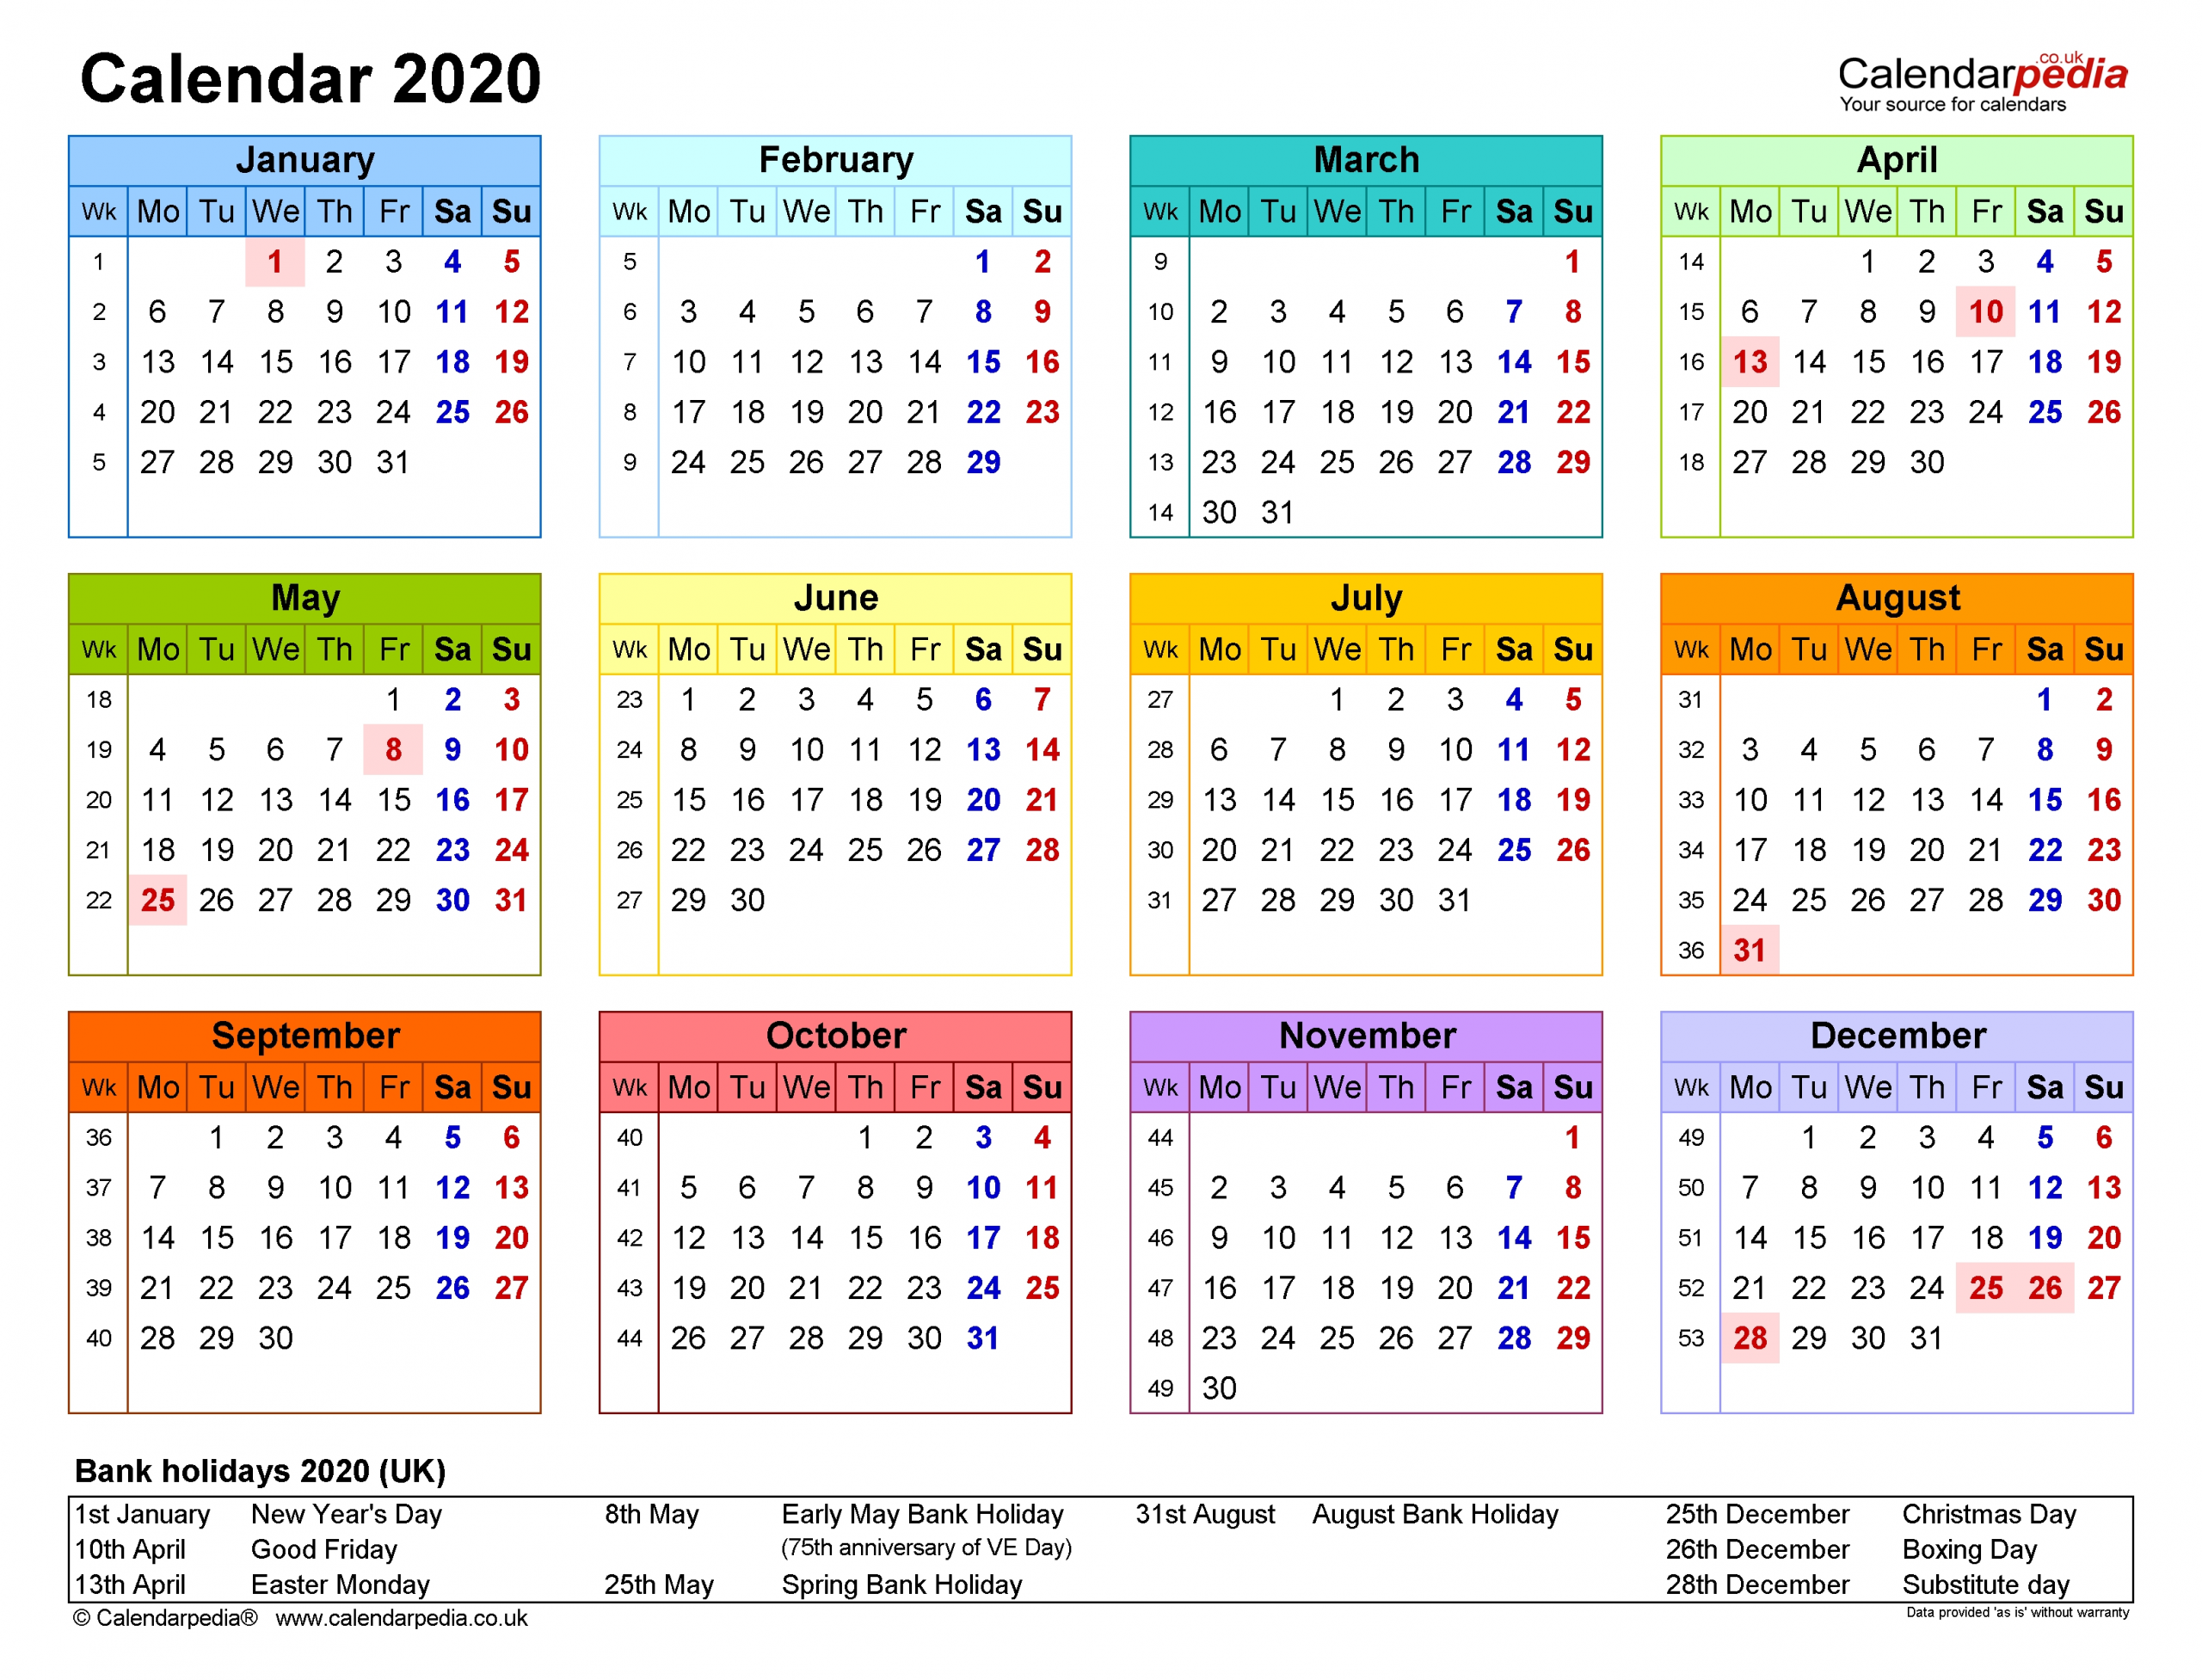 Calendar 2020 (Uk) - Free Printable Pdf Templates